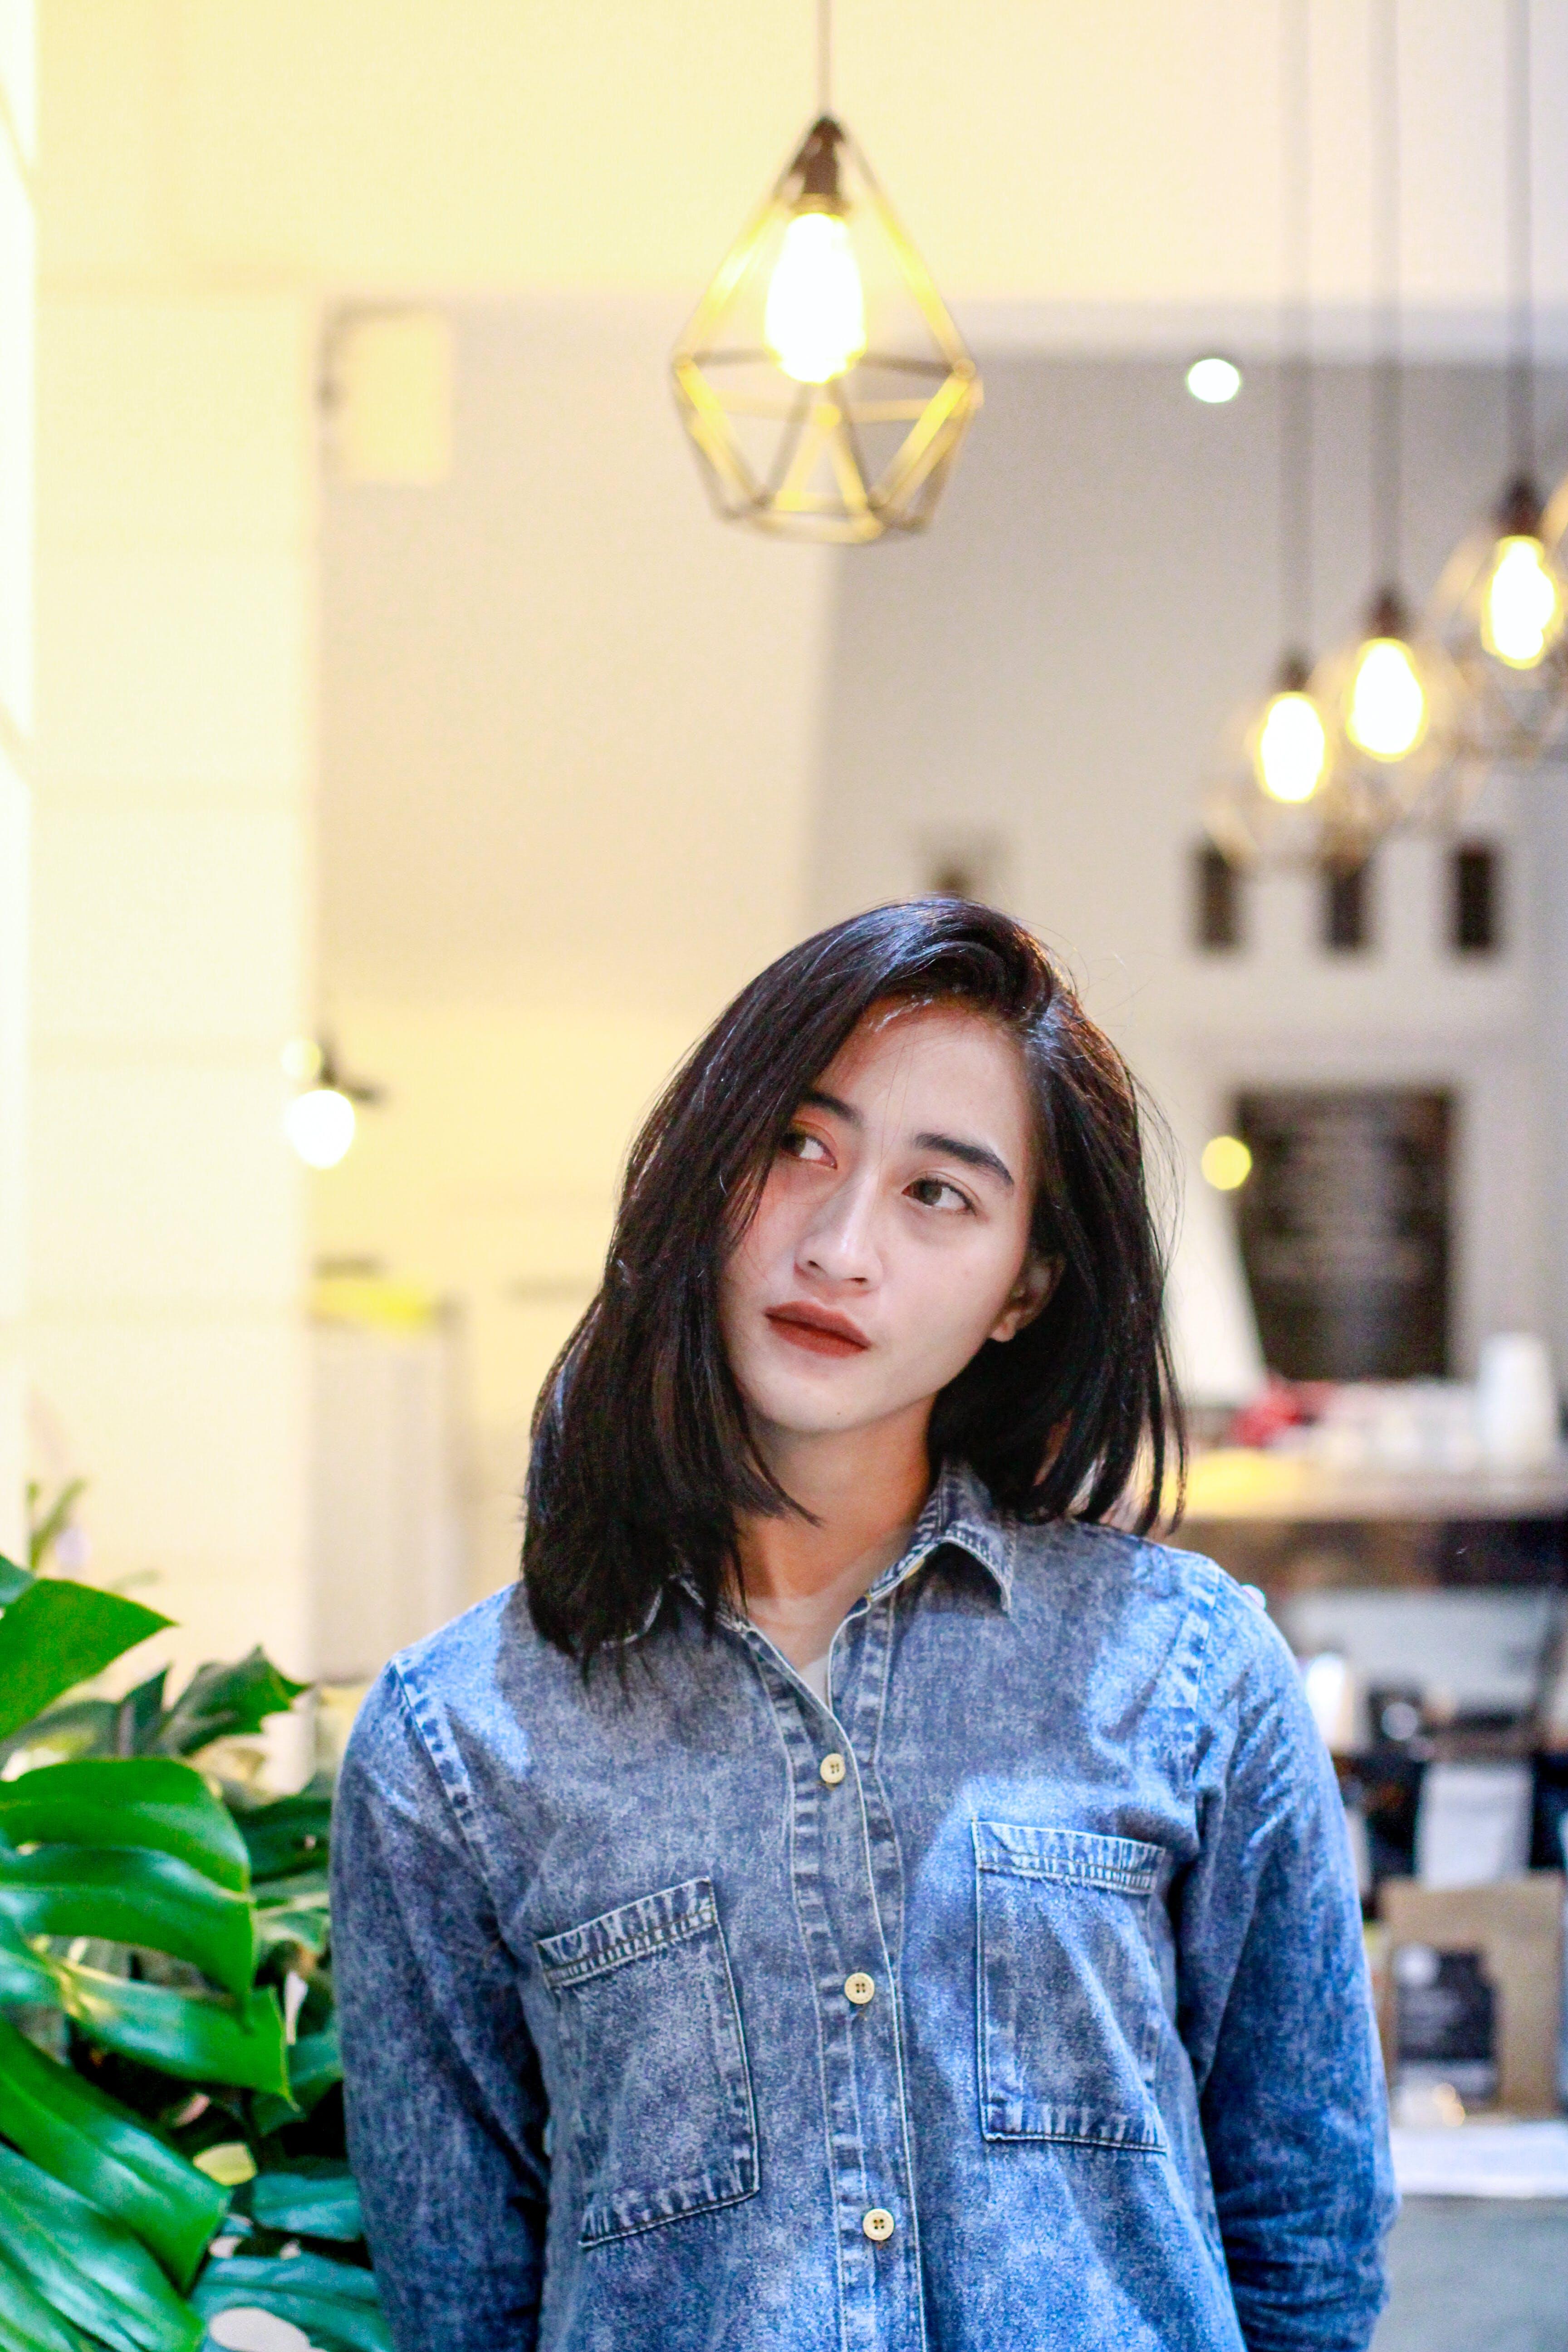 Woman in Blue Denim Button-up Jacket